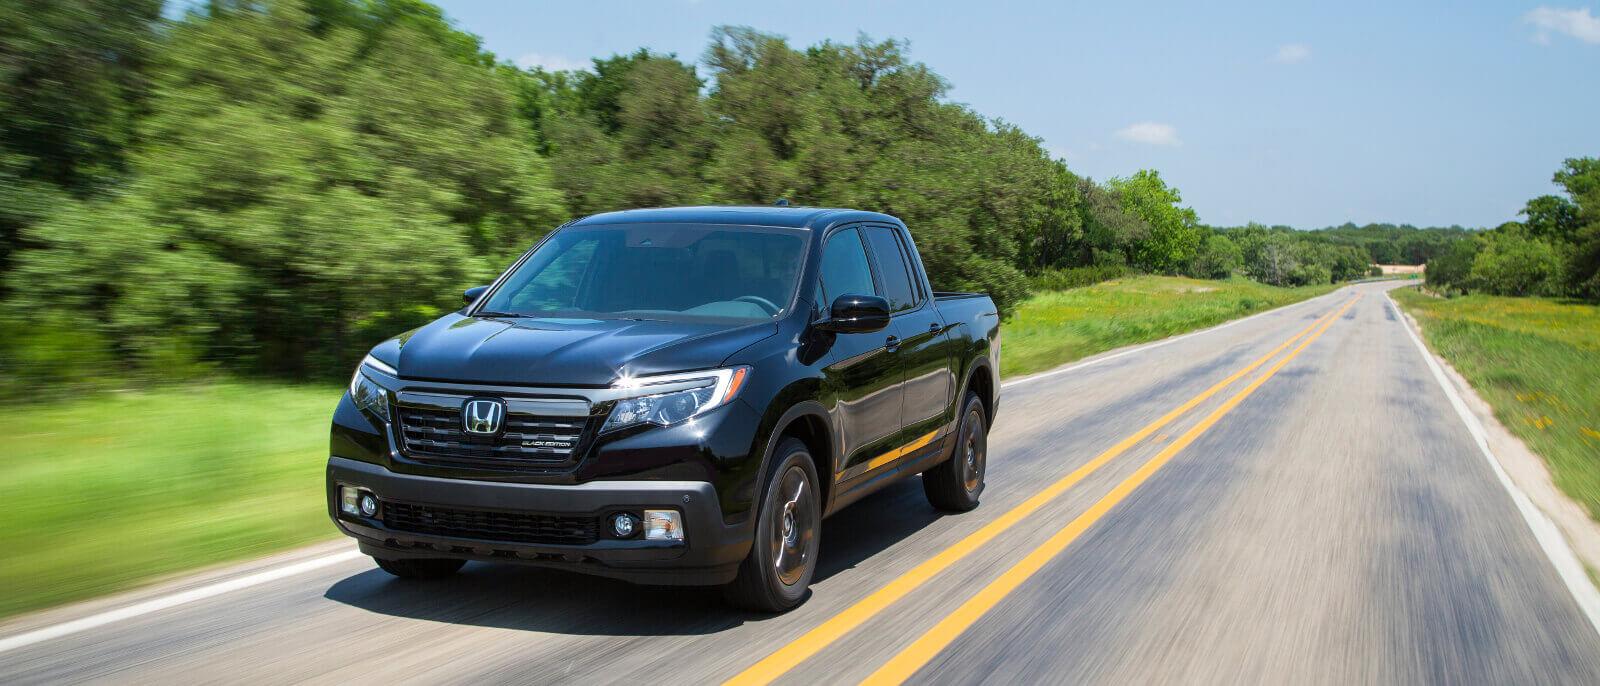 2017-Honda-Ridgeline-driving